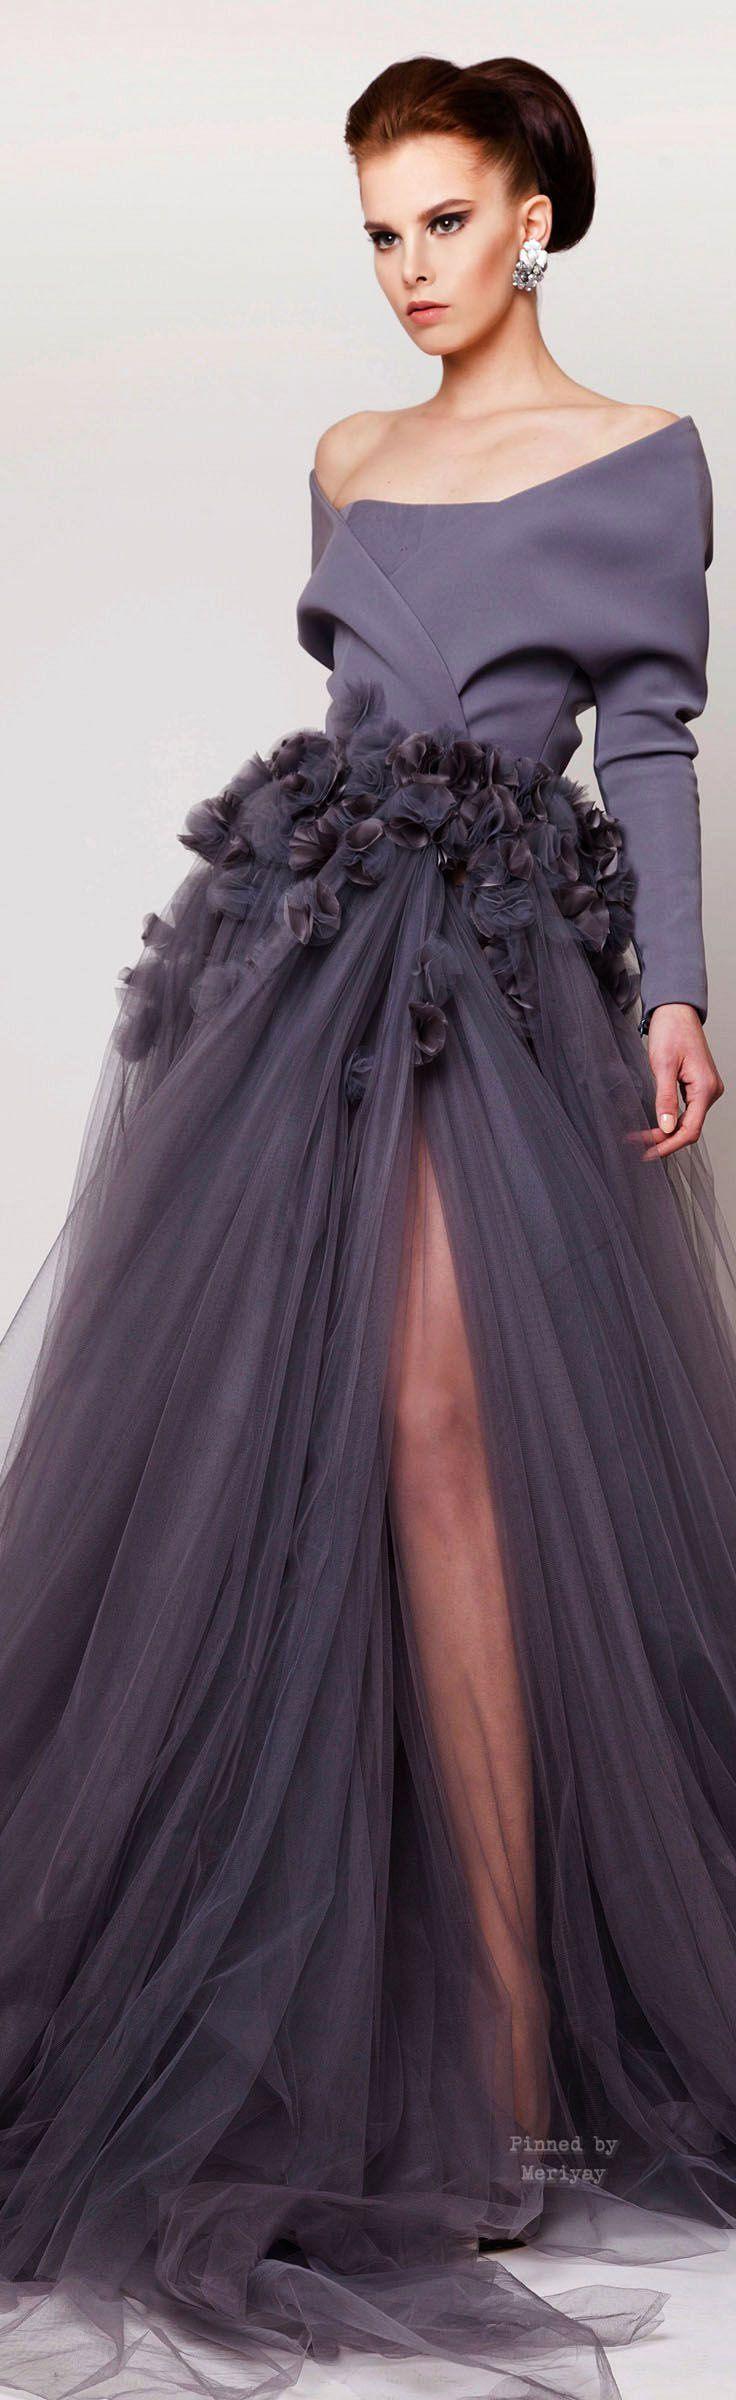 Maravilloso vestido de novia | Dresses | Pinterest | Vestidos de ...